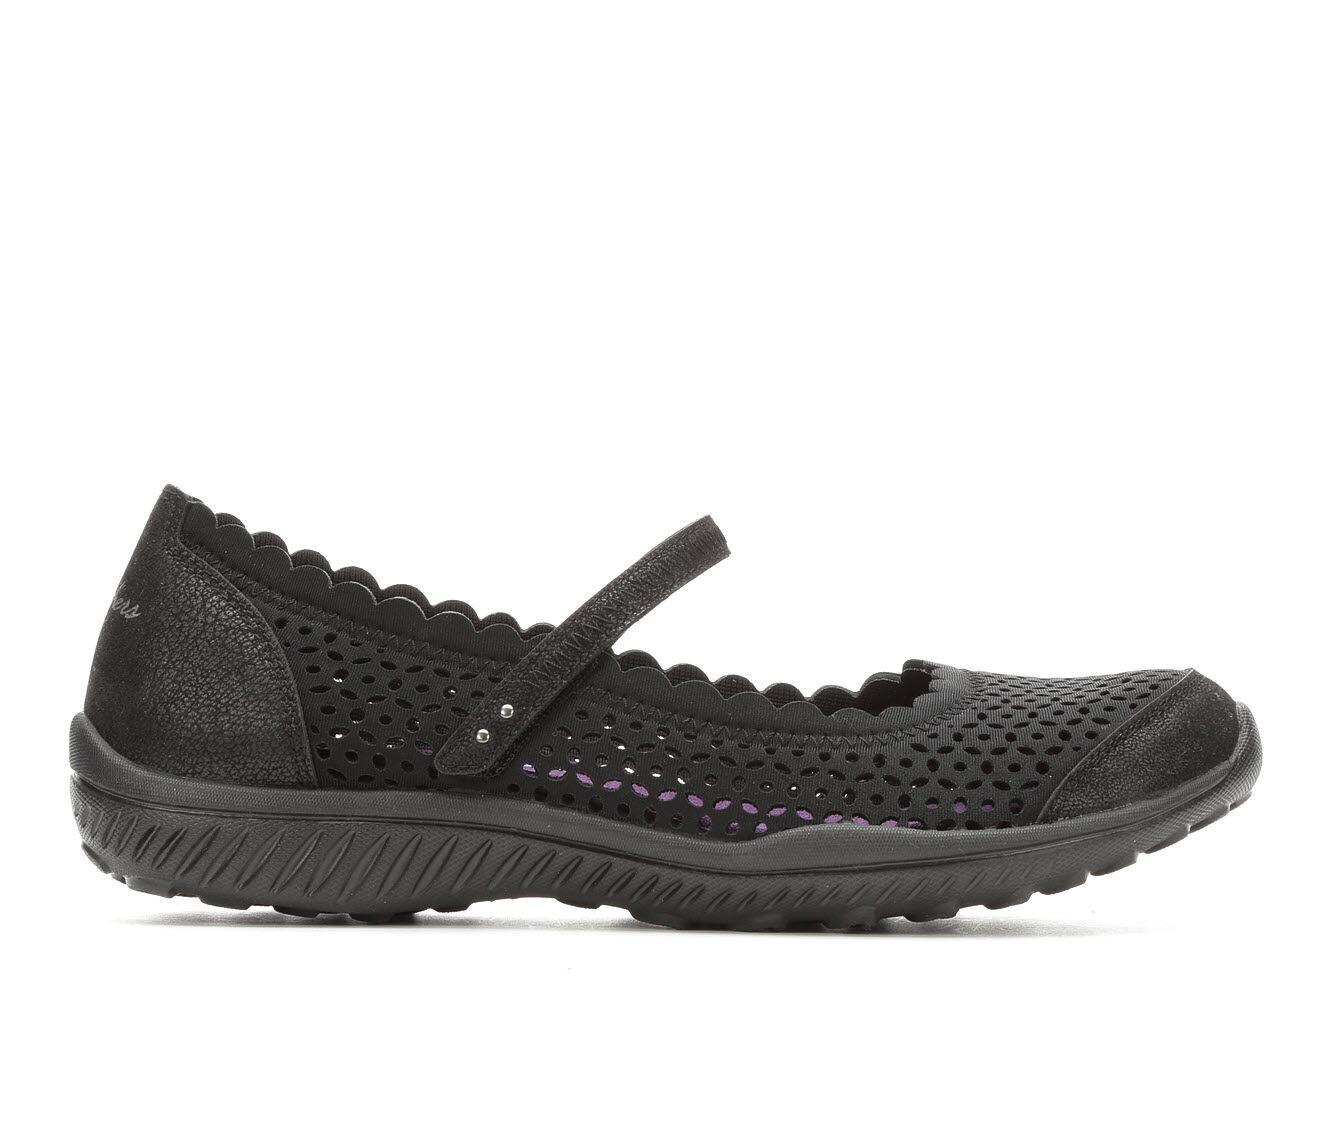 get cheap Women's Skechers My Desire 23290 Shoes Black